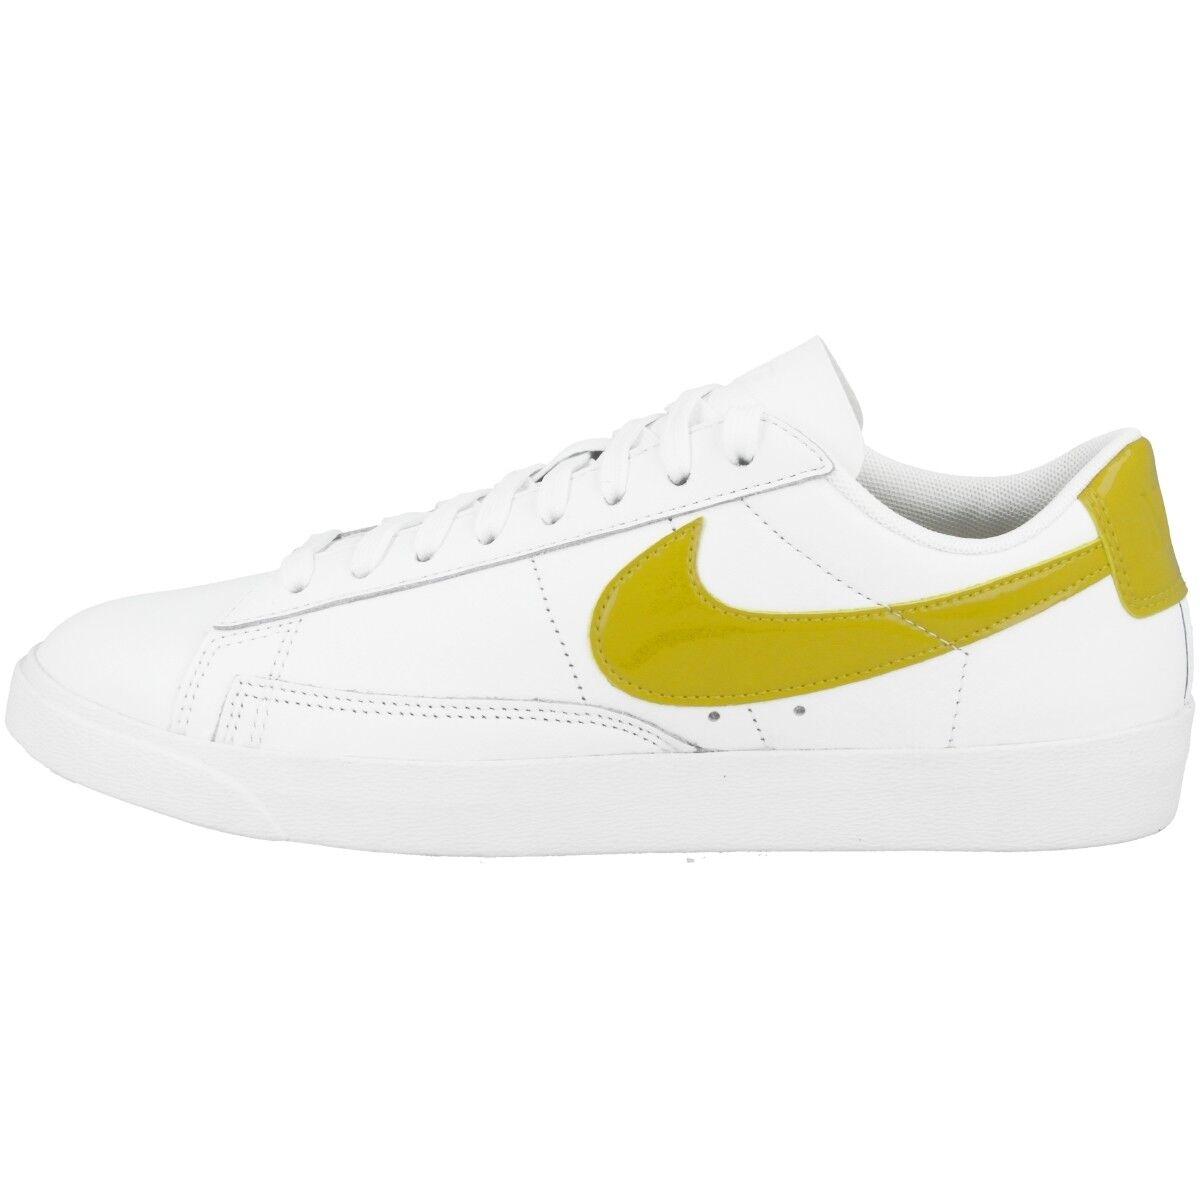 Nike Blazer low le donne pelle scarpe aa3961-108 da ginnastica in bianco aa3961-108 scarpe 08deae